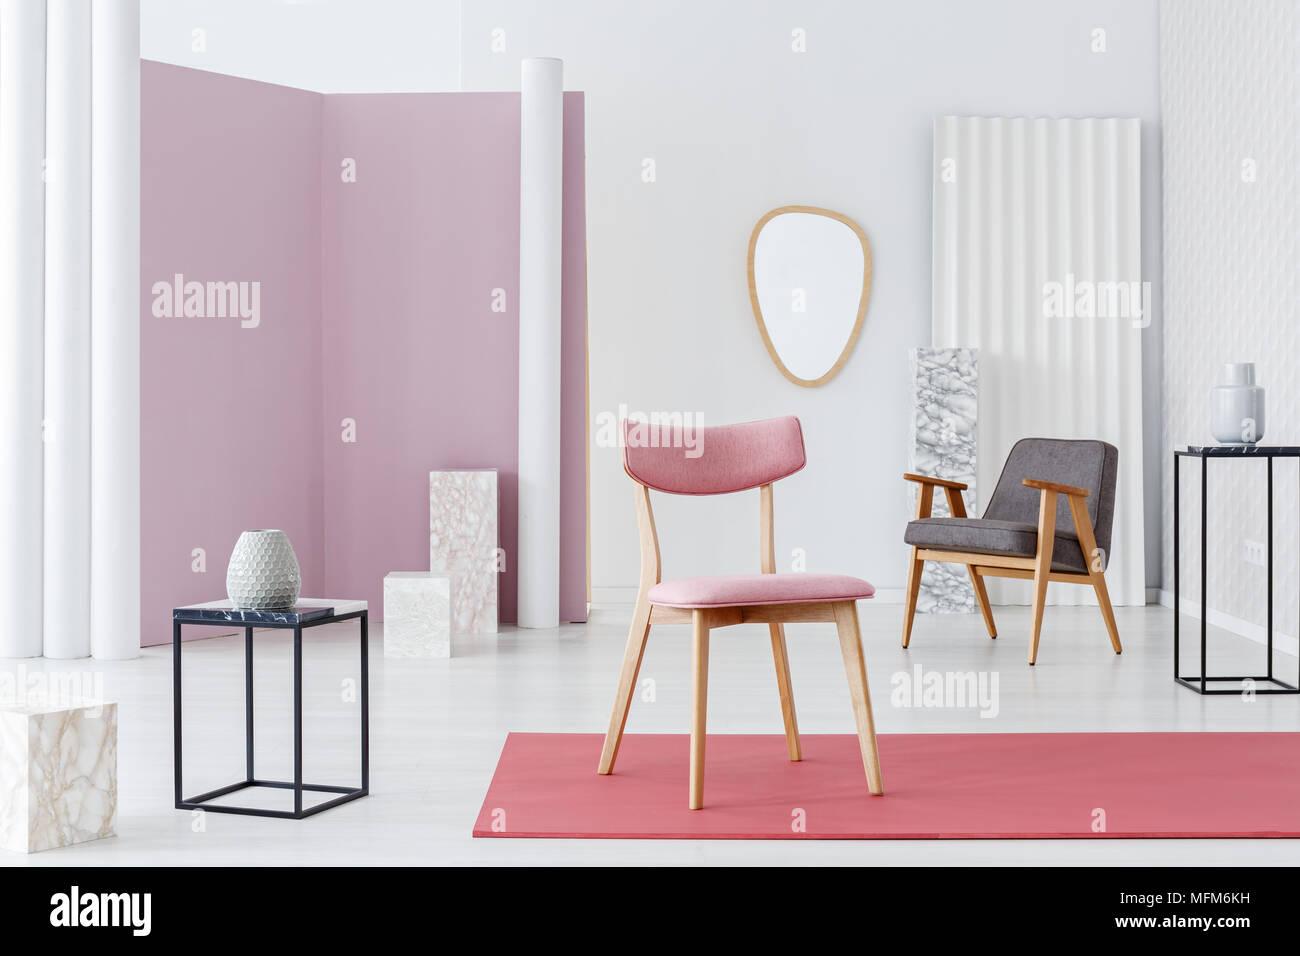 Sedia Imbottita Design : Rosa sedia imbottita poltrona moderna e i cubi di marmo con